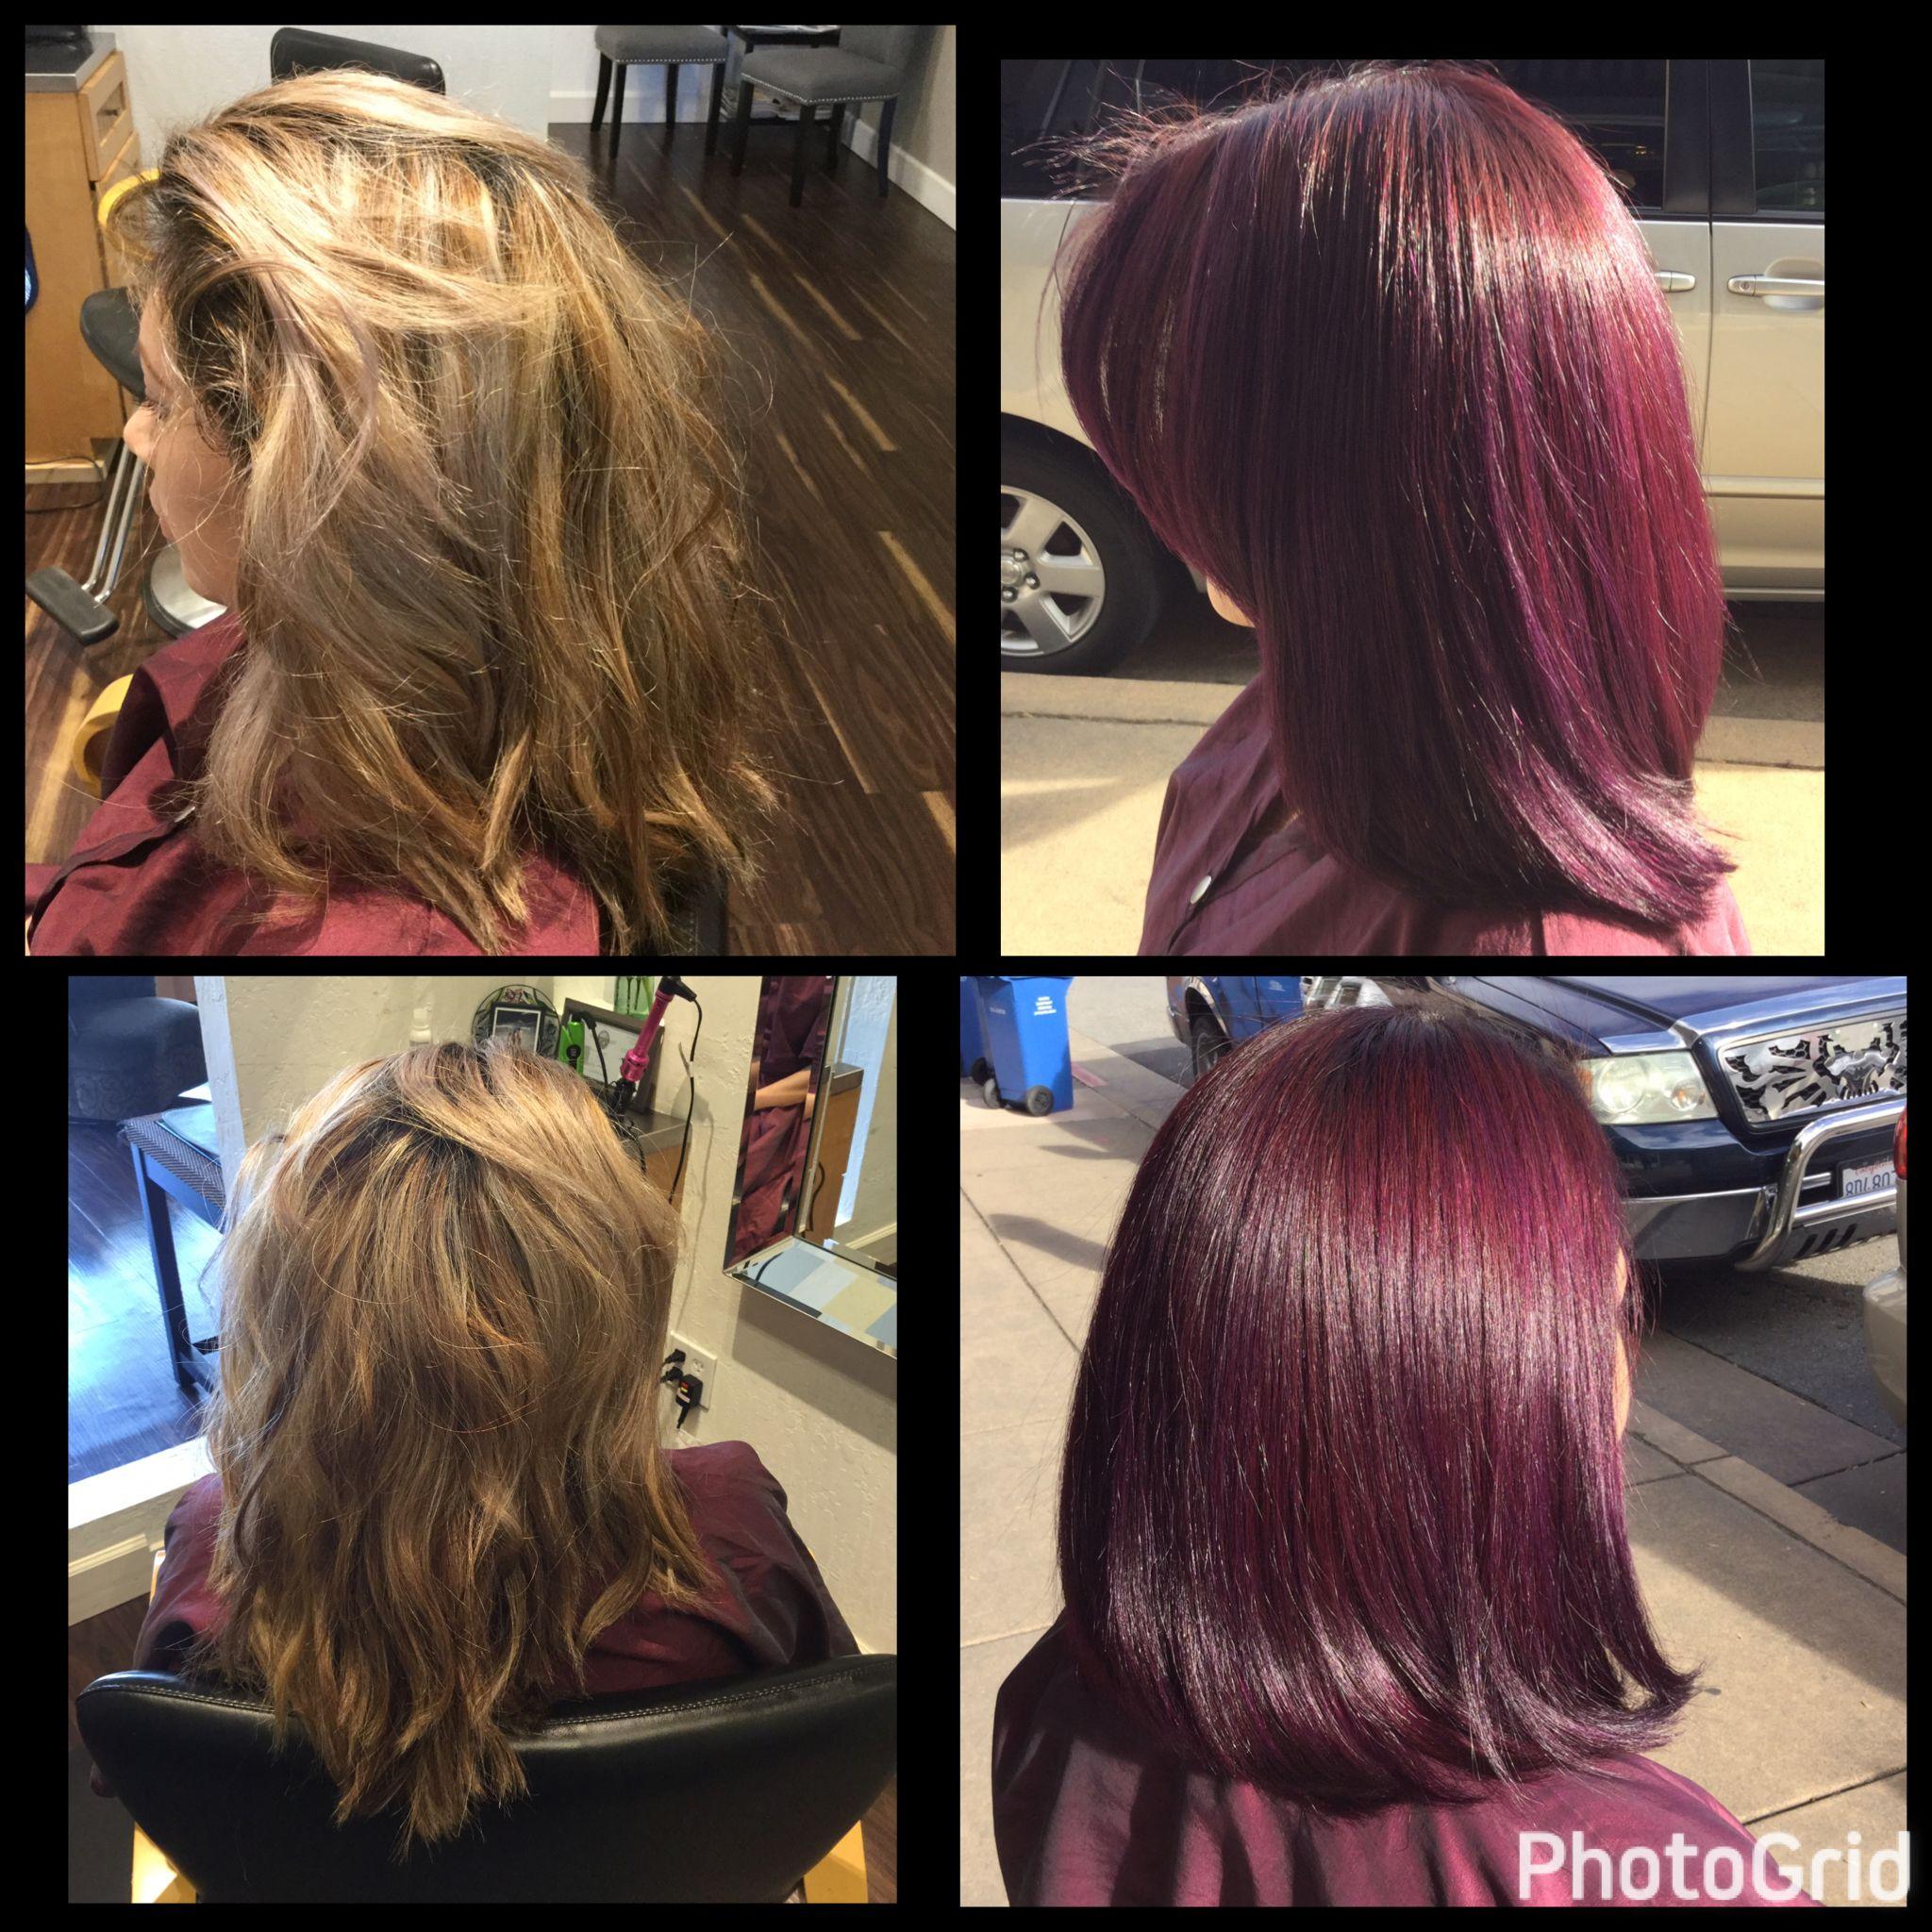 Merlot hair color -  Merlot Hair Color And Cut By Aveda S Hairstylist Joel Pisani San Rafael